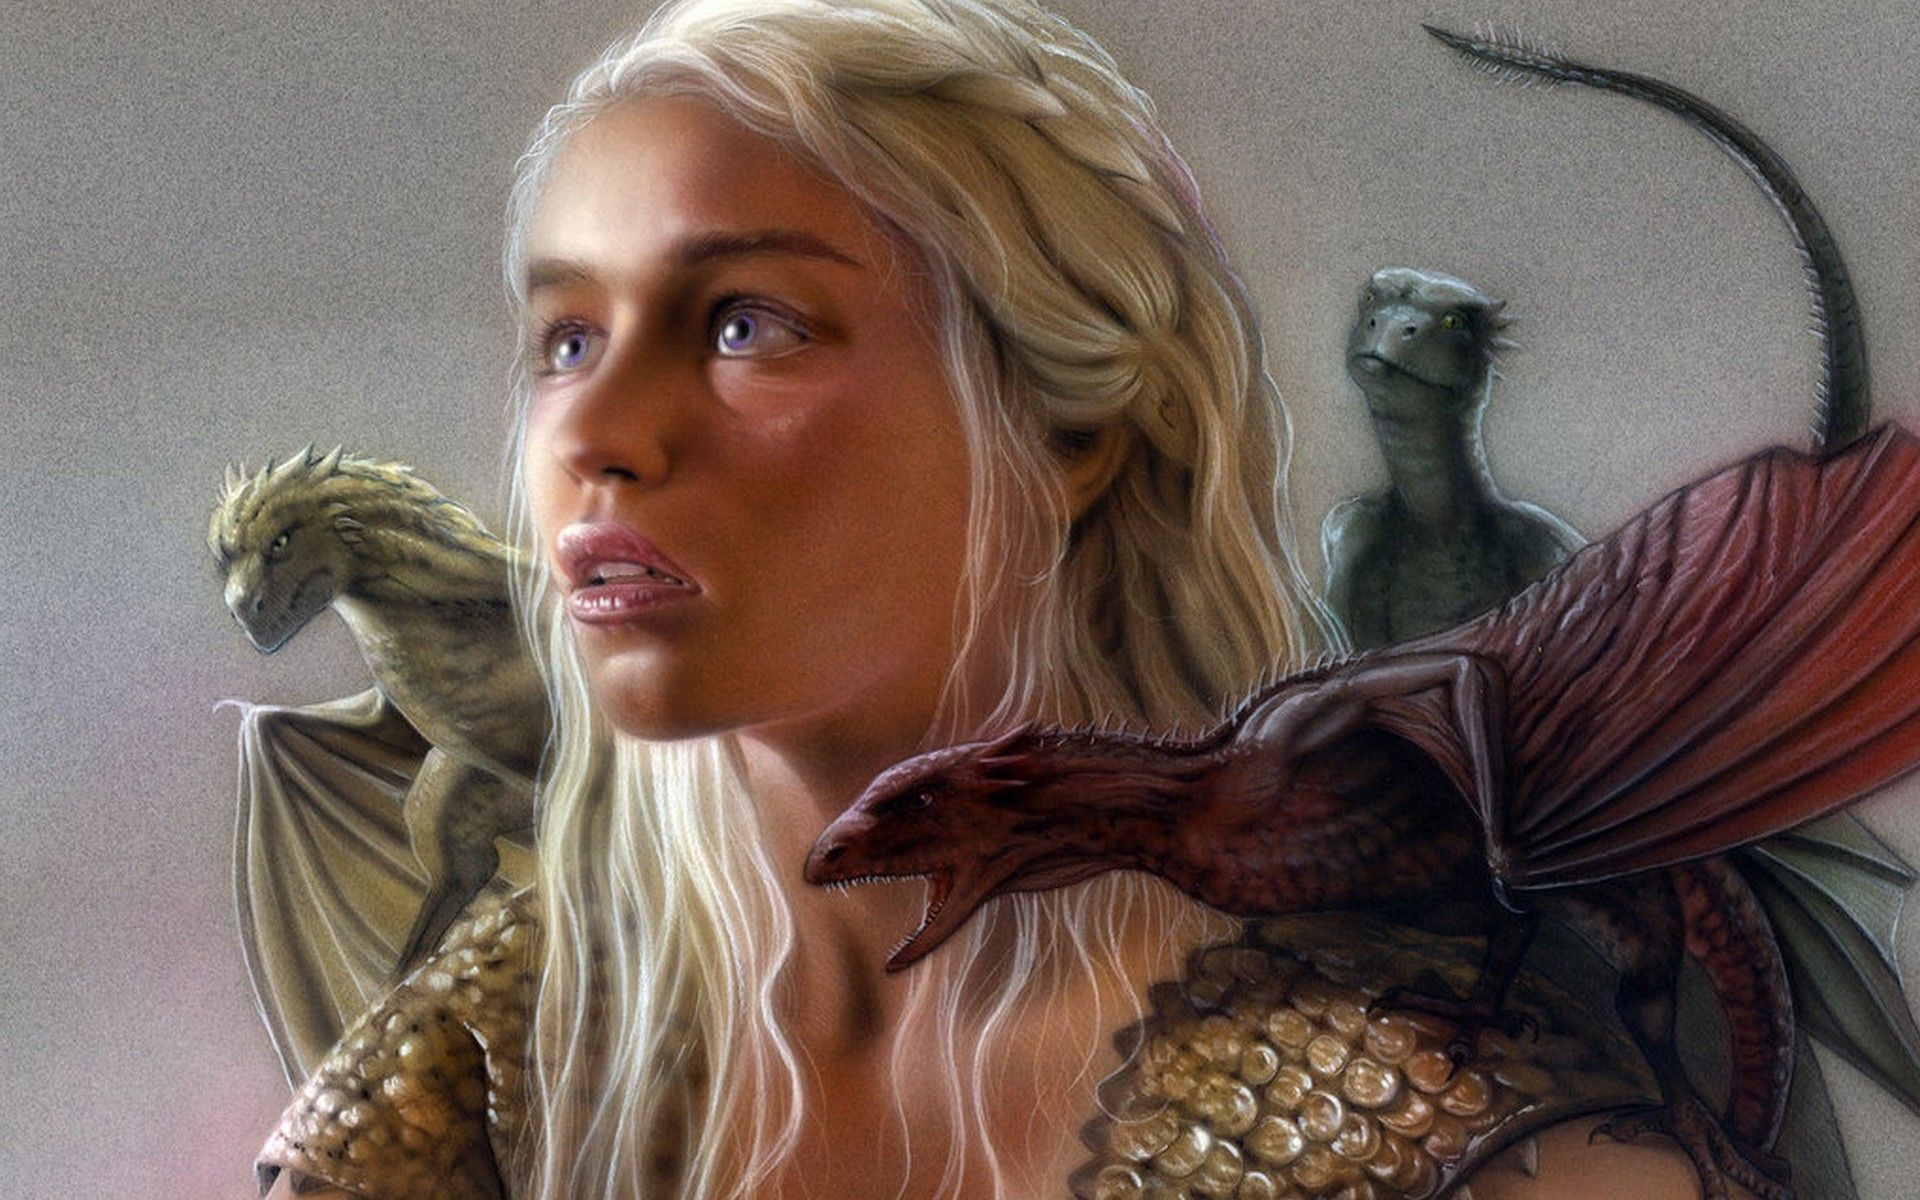 Daenerys targaryen and khal drogo wallpaper daenerys targaryen wedding - Daenerys Targaryen Game Of Thrones Desktop Wallpaper 1920x1200 Click For Original Size